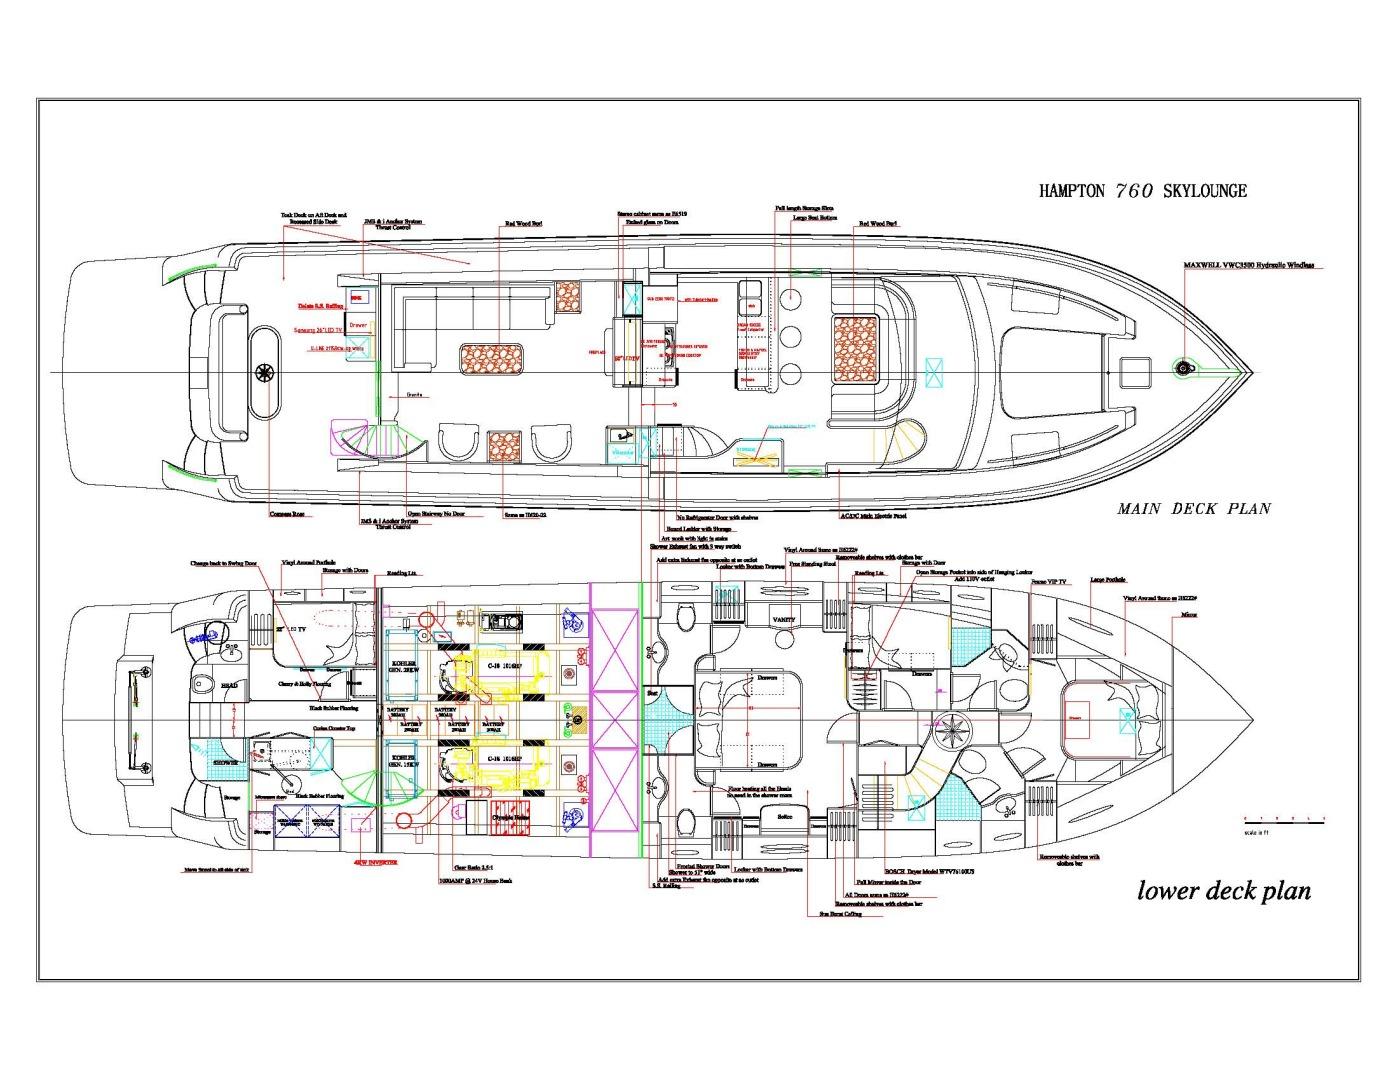 Hampton-76 Skylounge Motoryacht 2014-ODYSEA San Diego-California-United States-LAYOUT-1165966 | Thumbnail